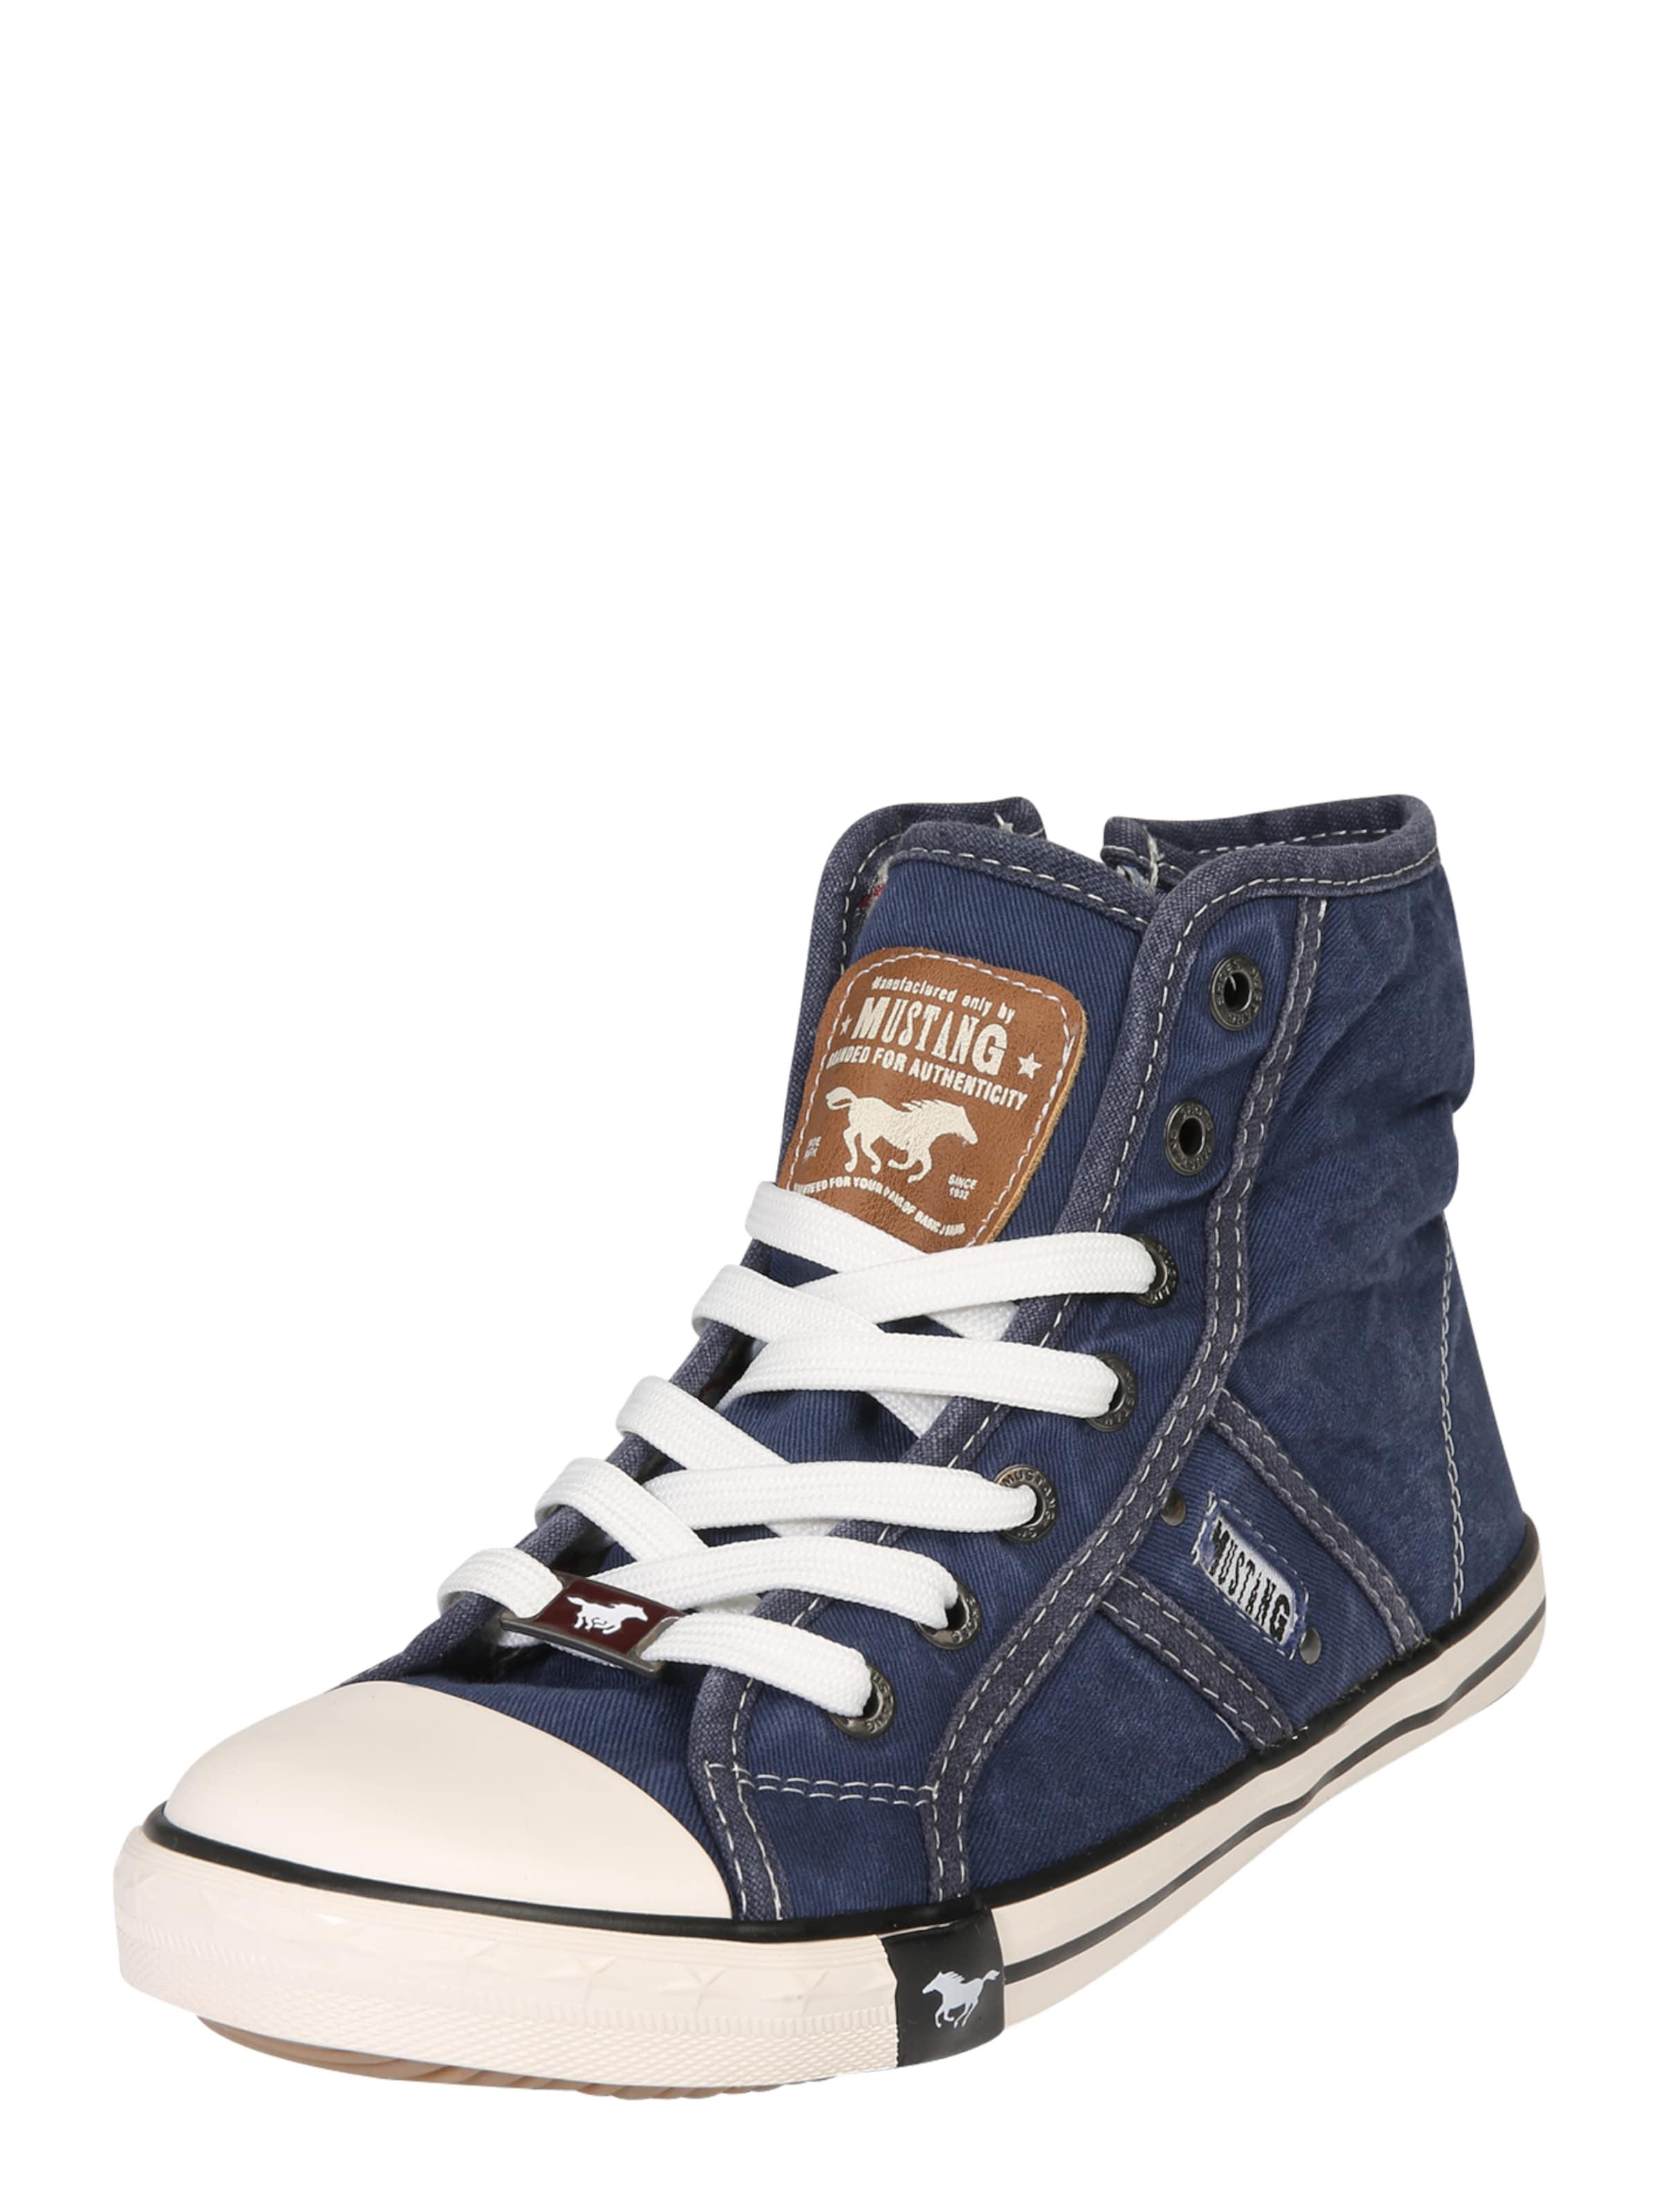 MUSTANG Hohe Sneaker aus Canvas Hohe Qualität